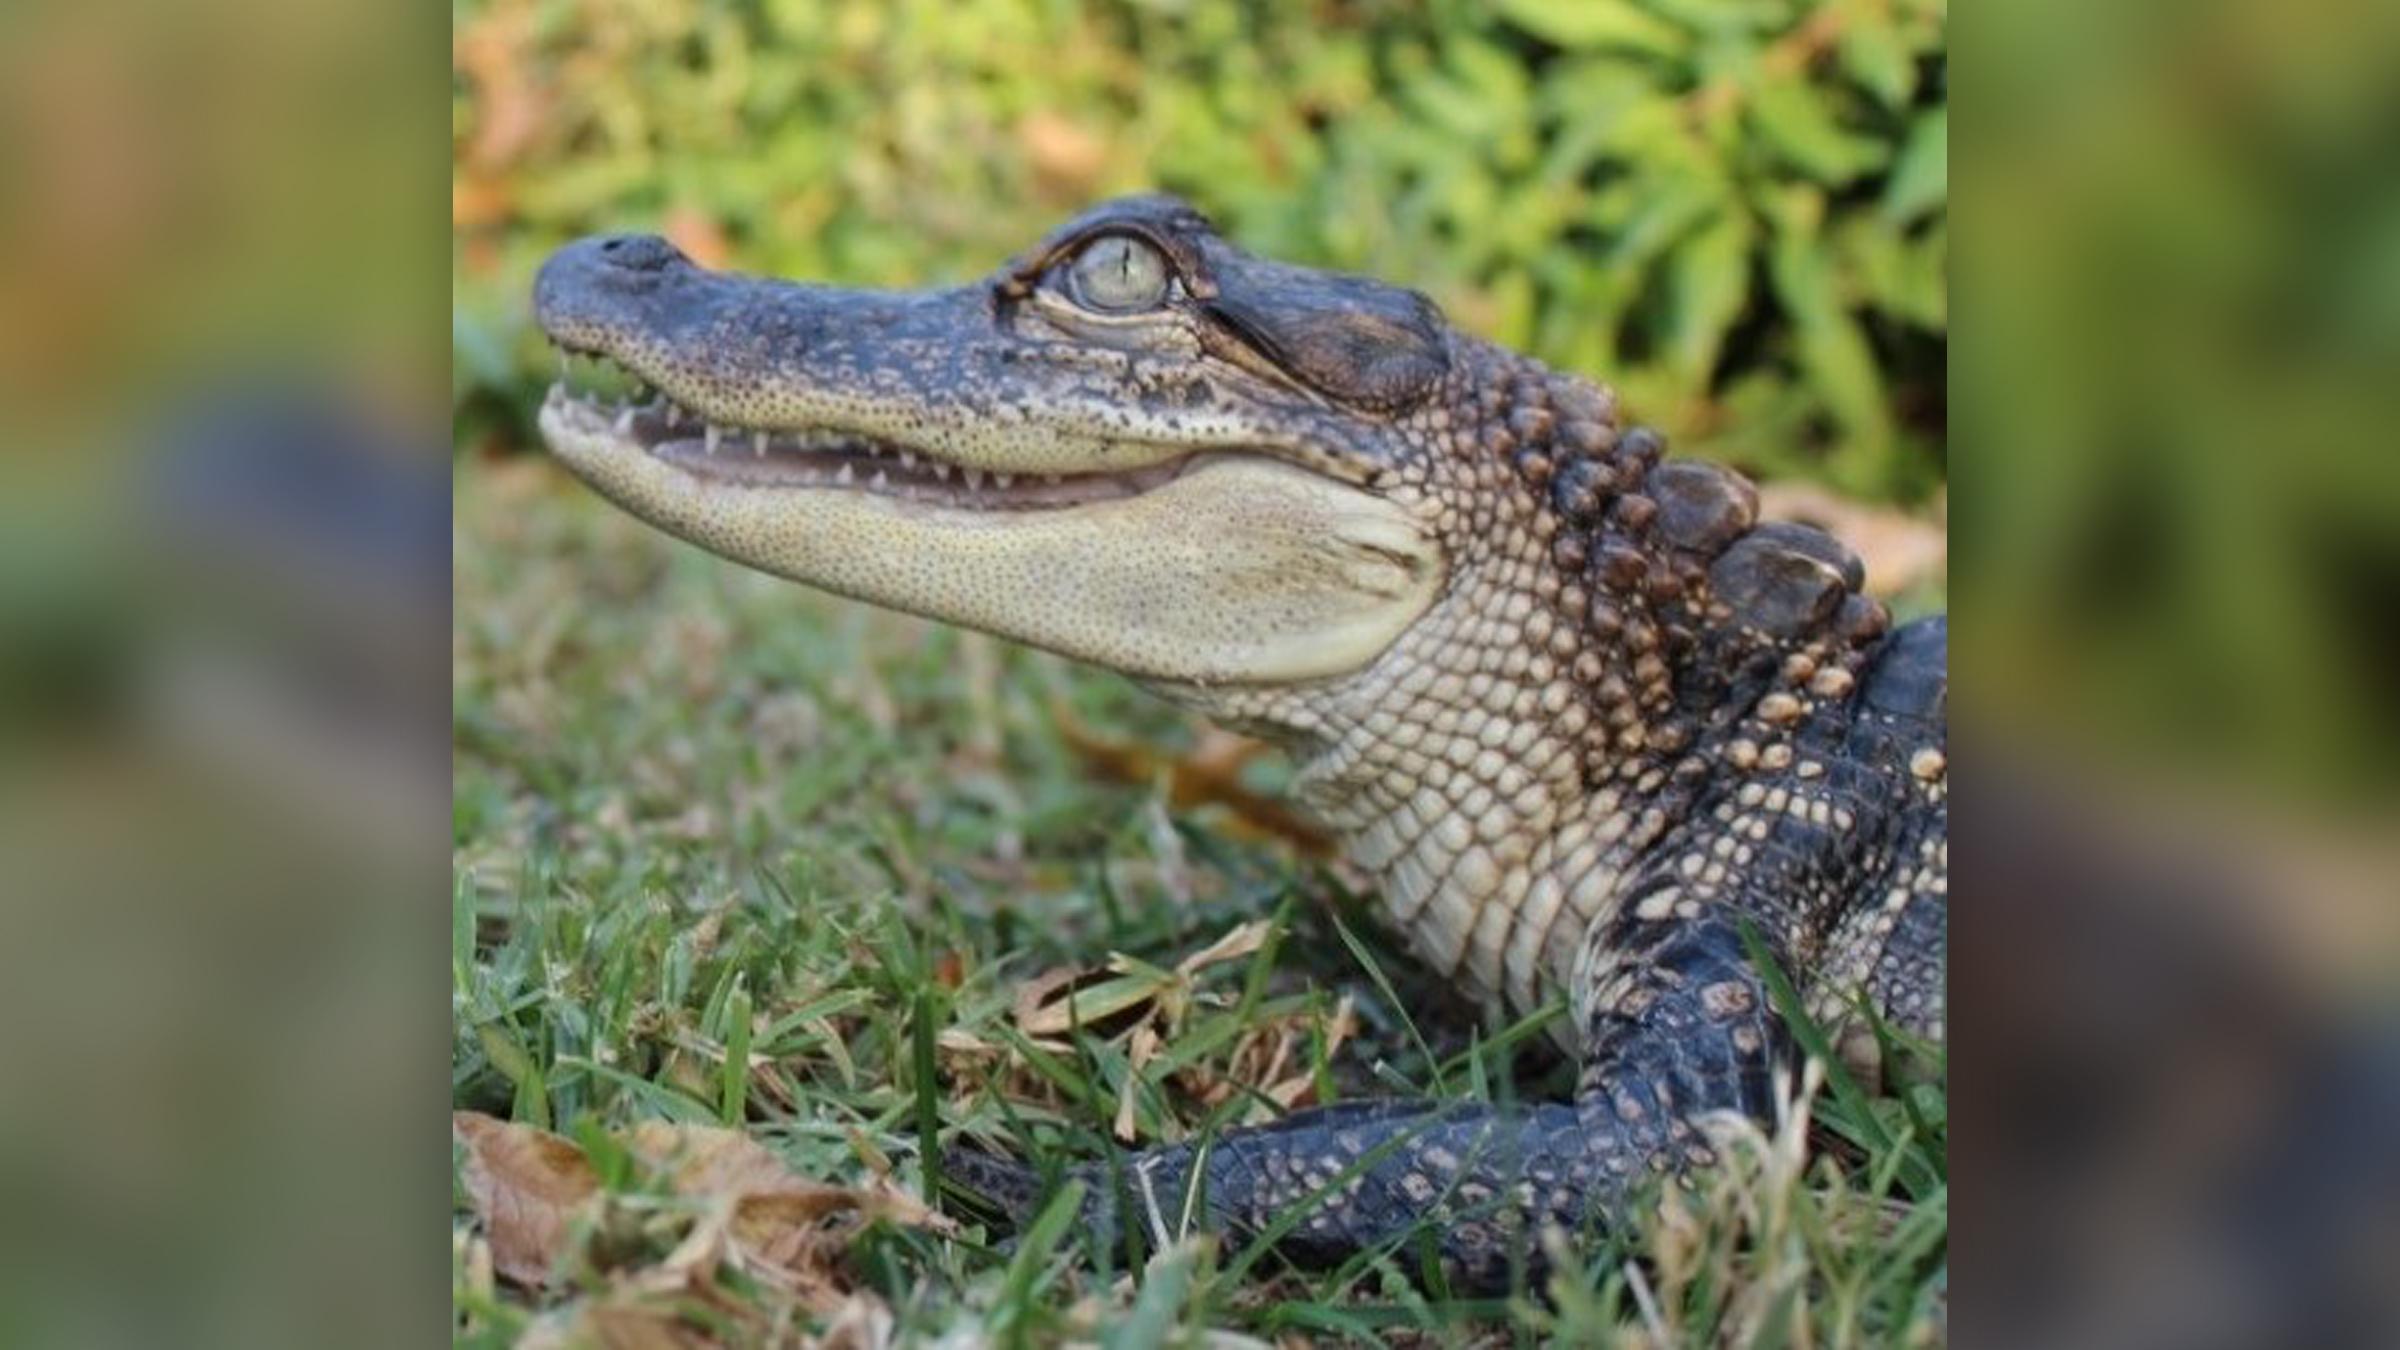 un alligator dans l'herbe